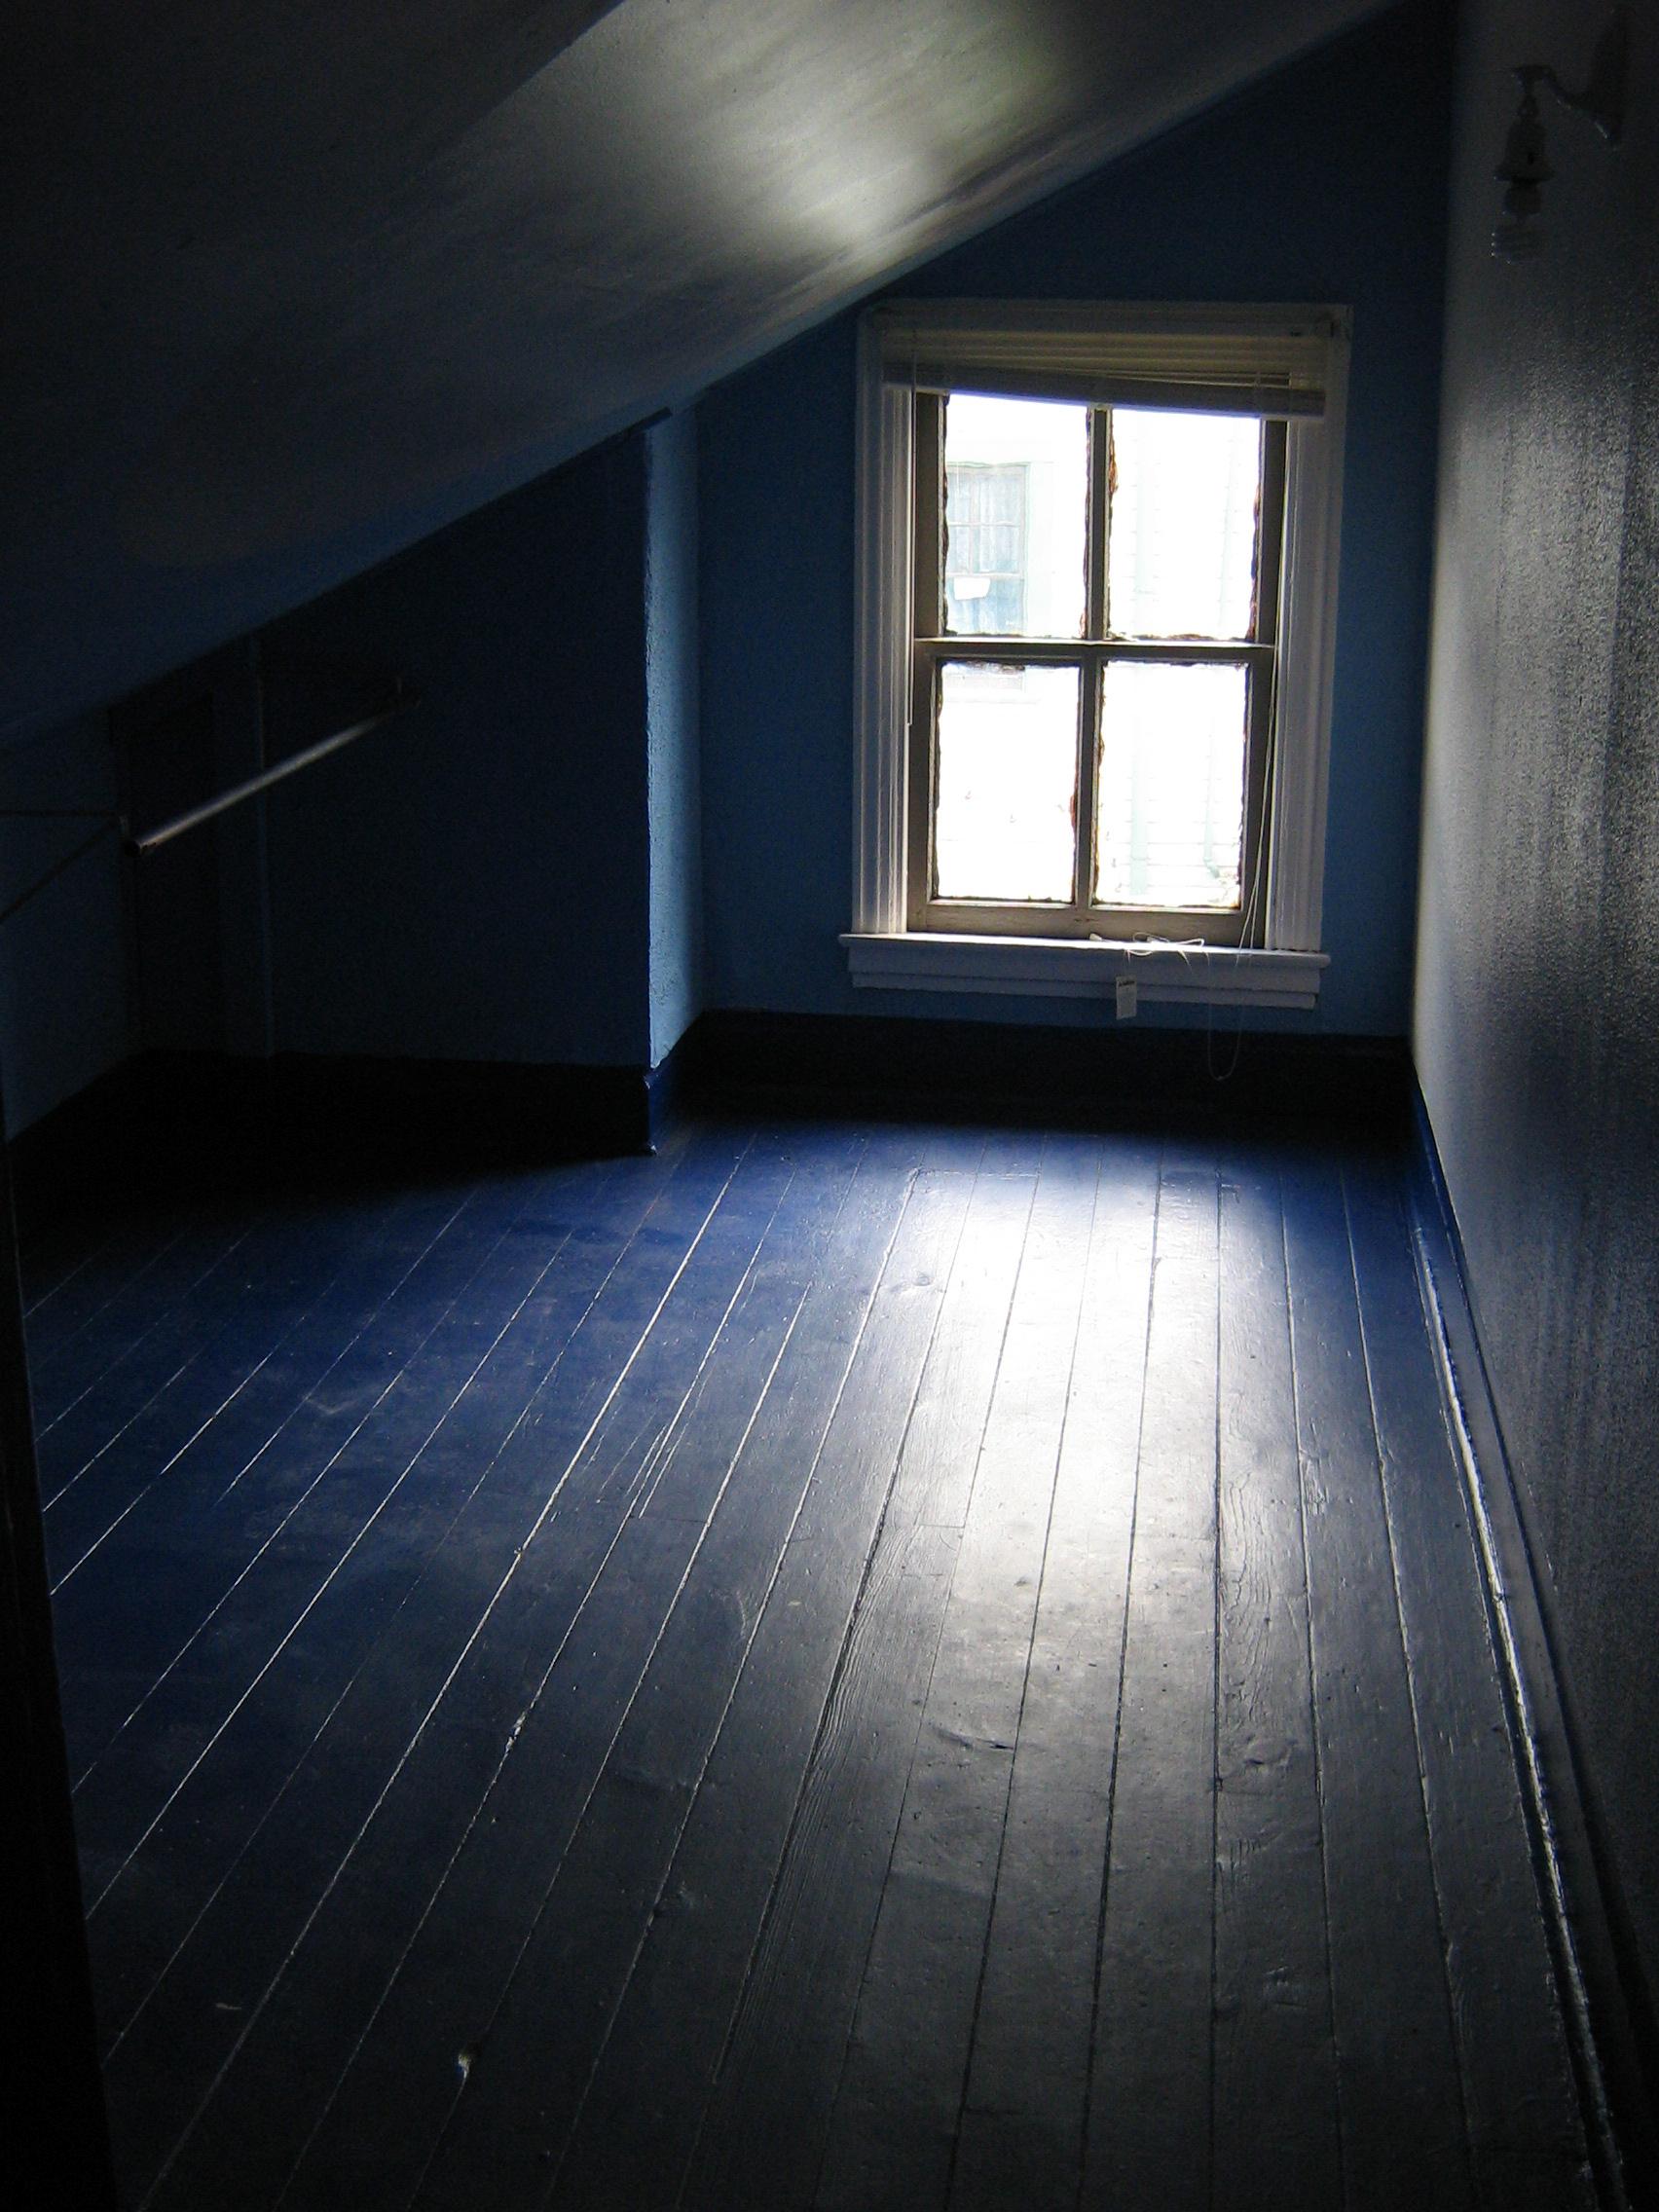 Dark Empty Room With Window